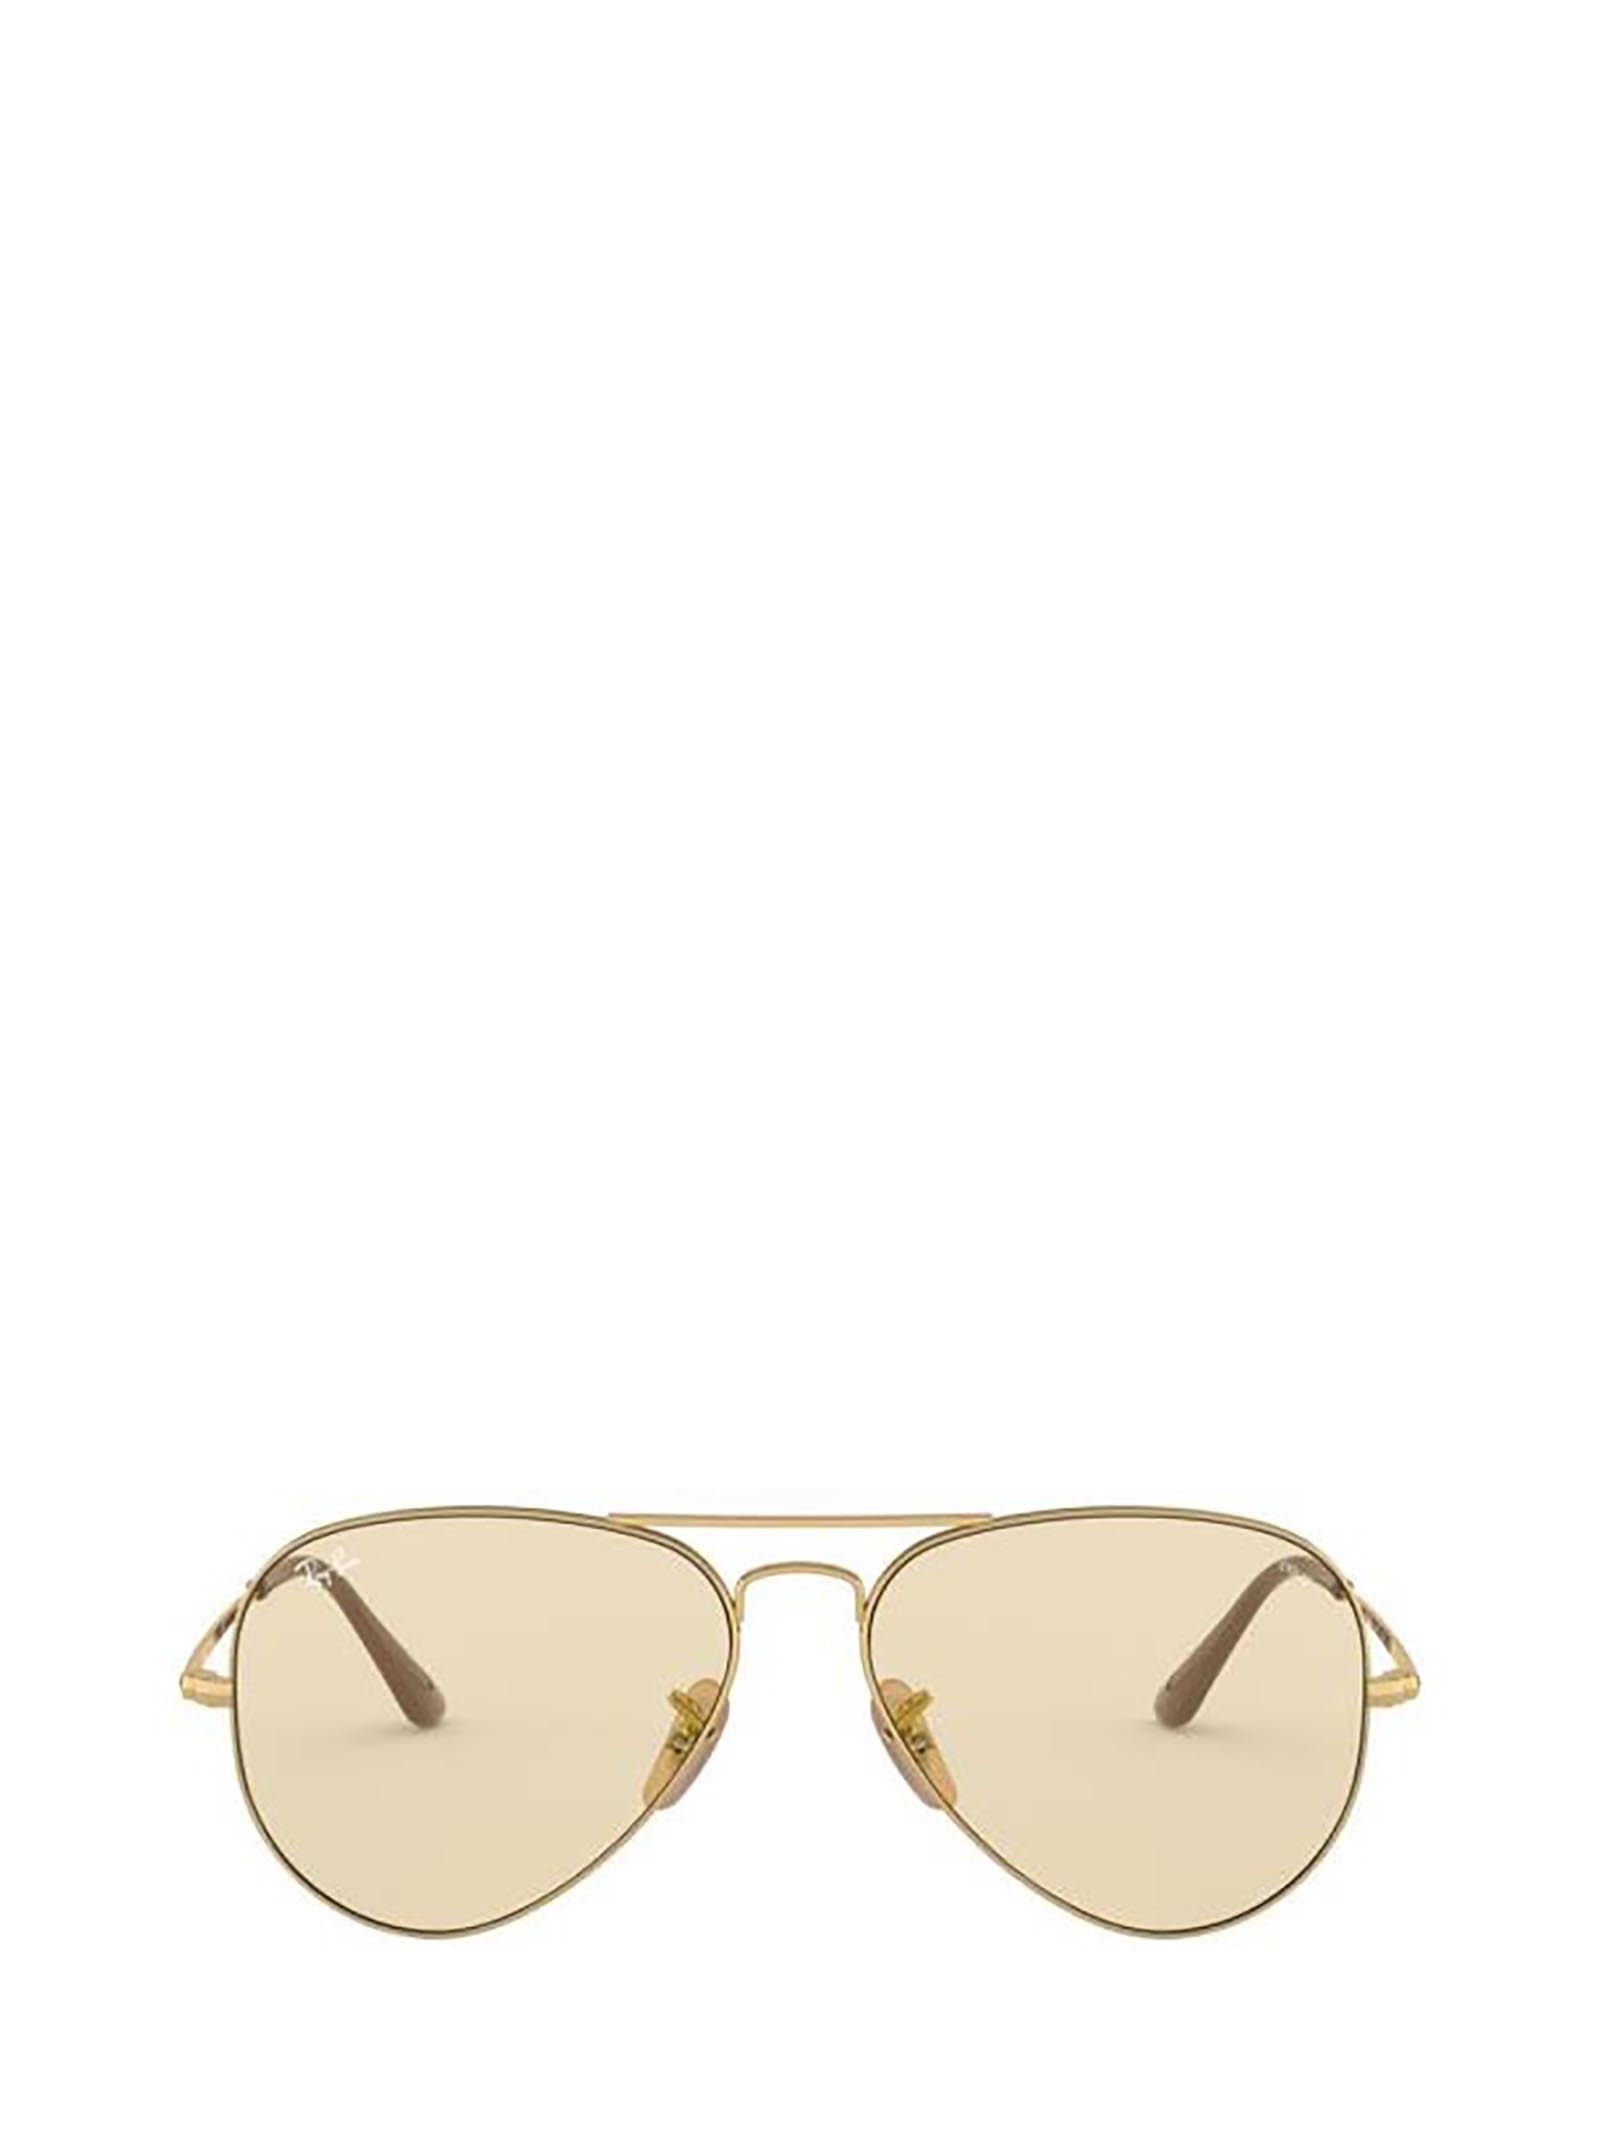 Ray-Ban Ray-ban Rb3689 Gold Sunglasses